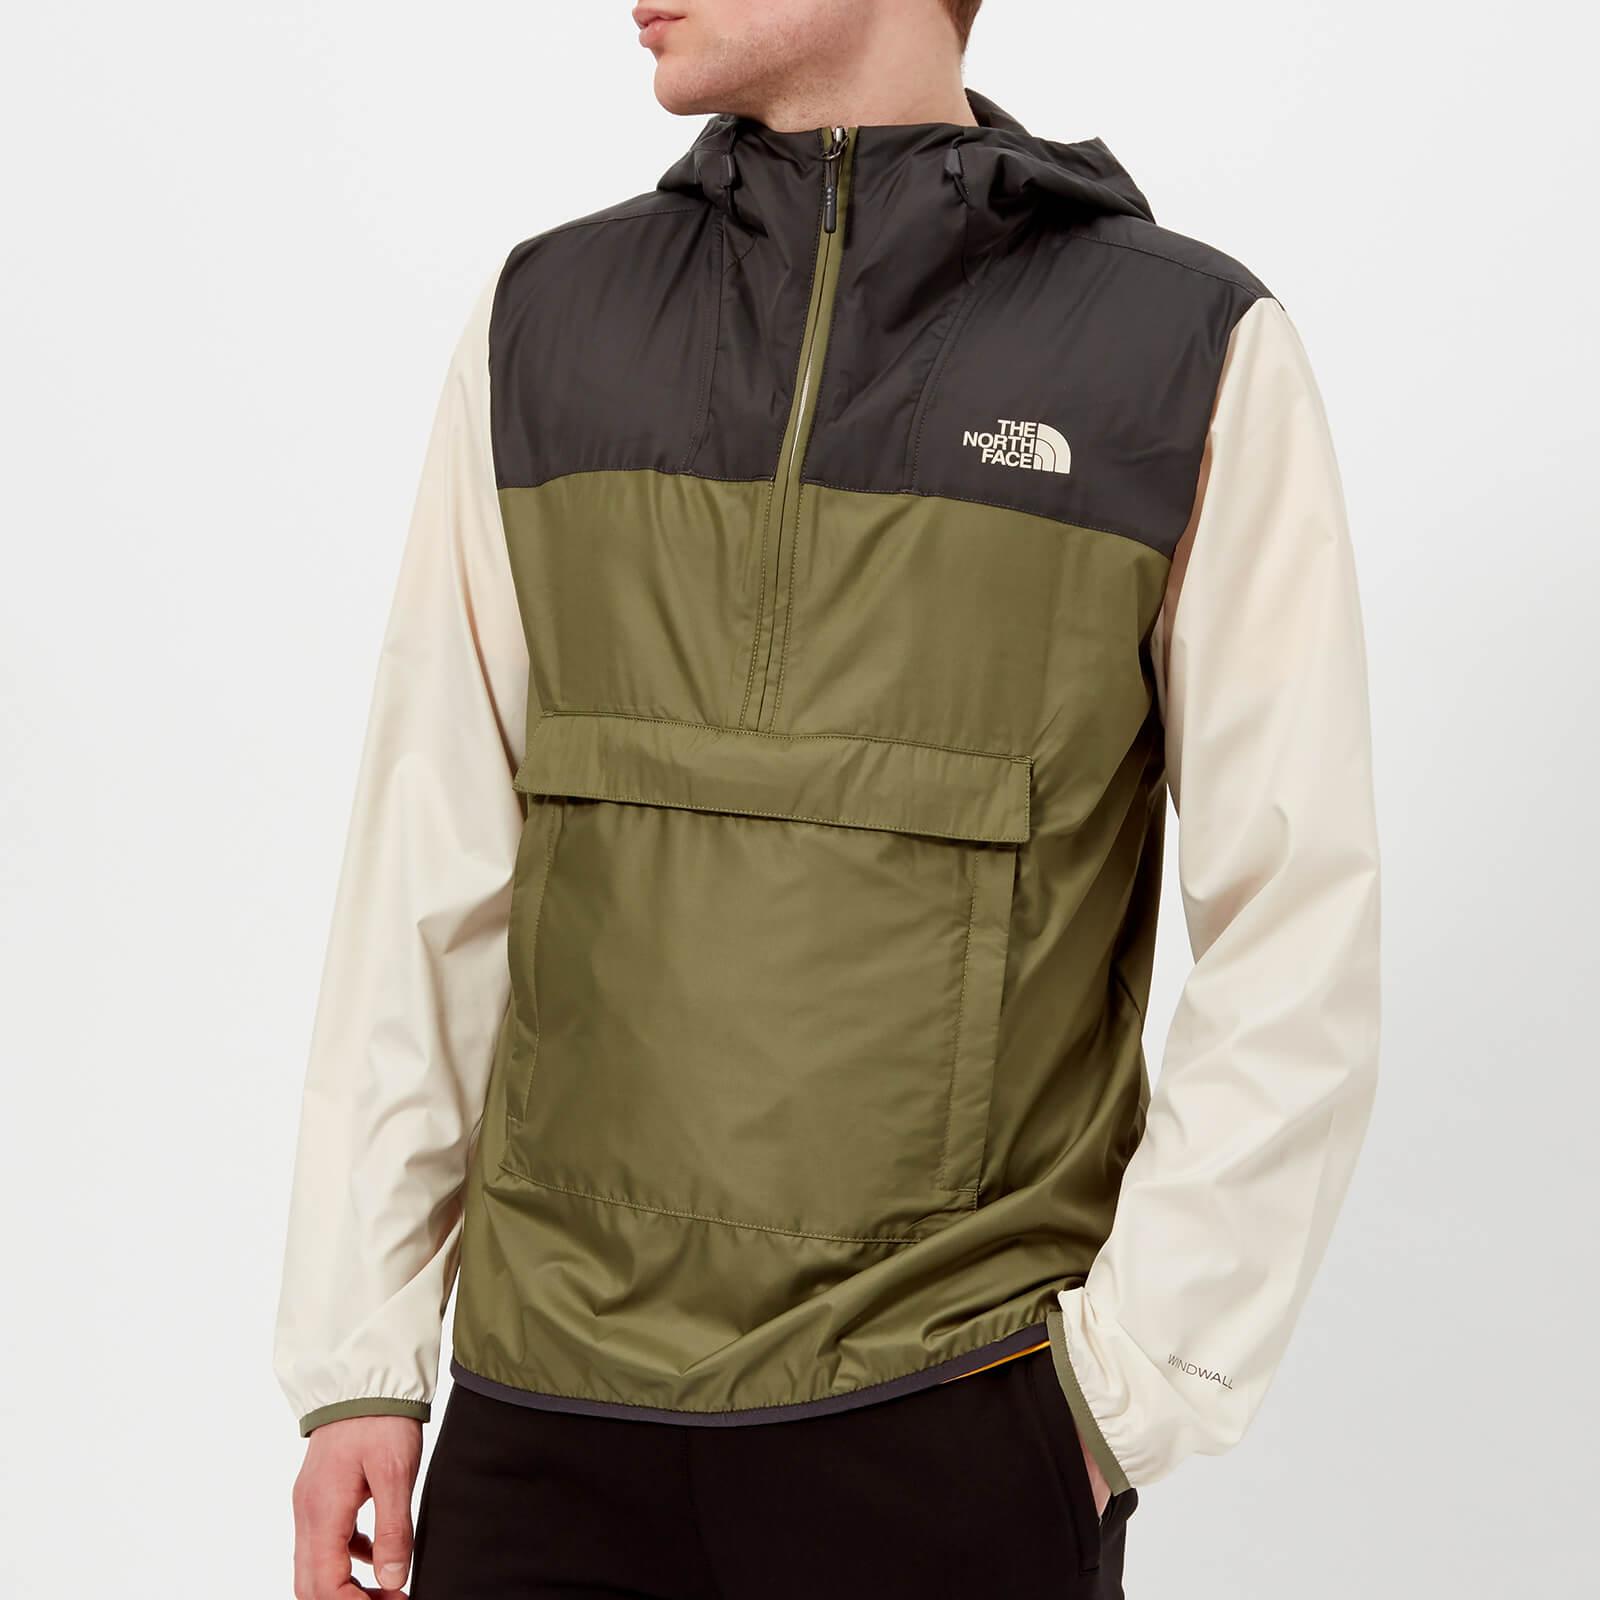 ddde302c3 The North Face Men's Fanorak Jacket - Four Leaf Clover Multi